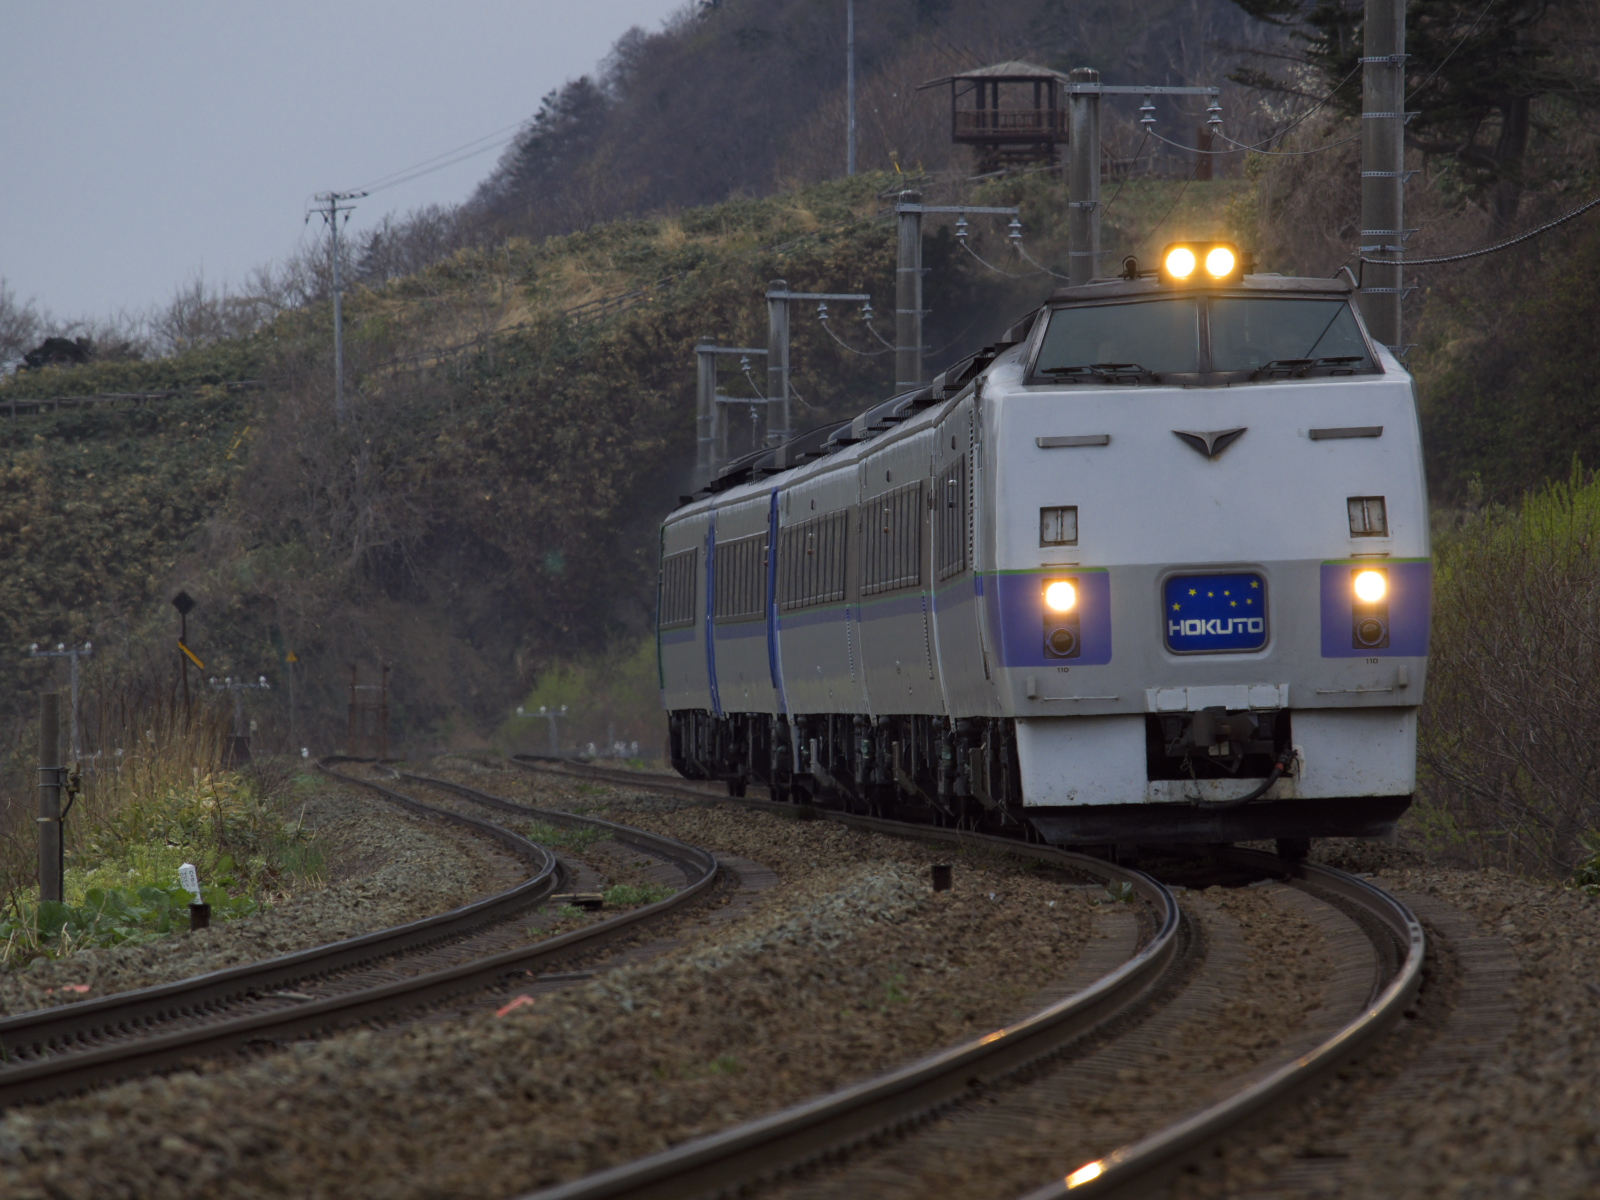 P4301107.jpg